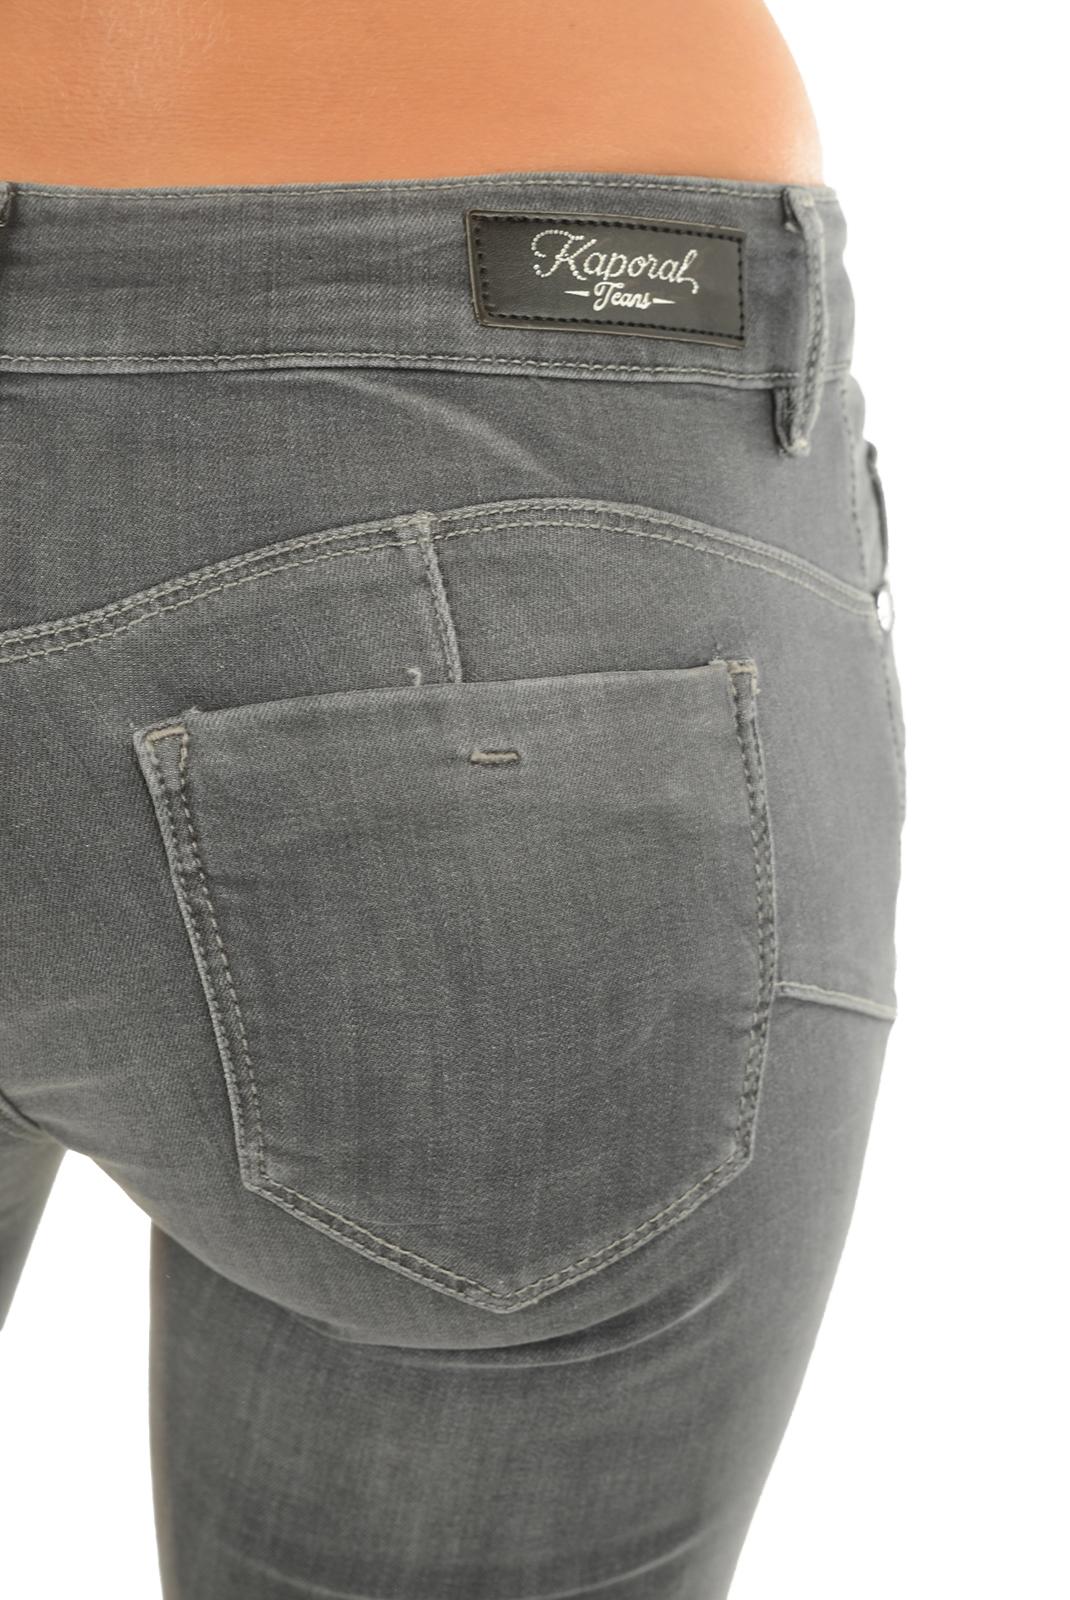 Jeans   Kaporal LOKA H17 METAL